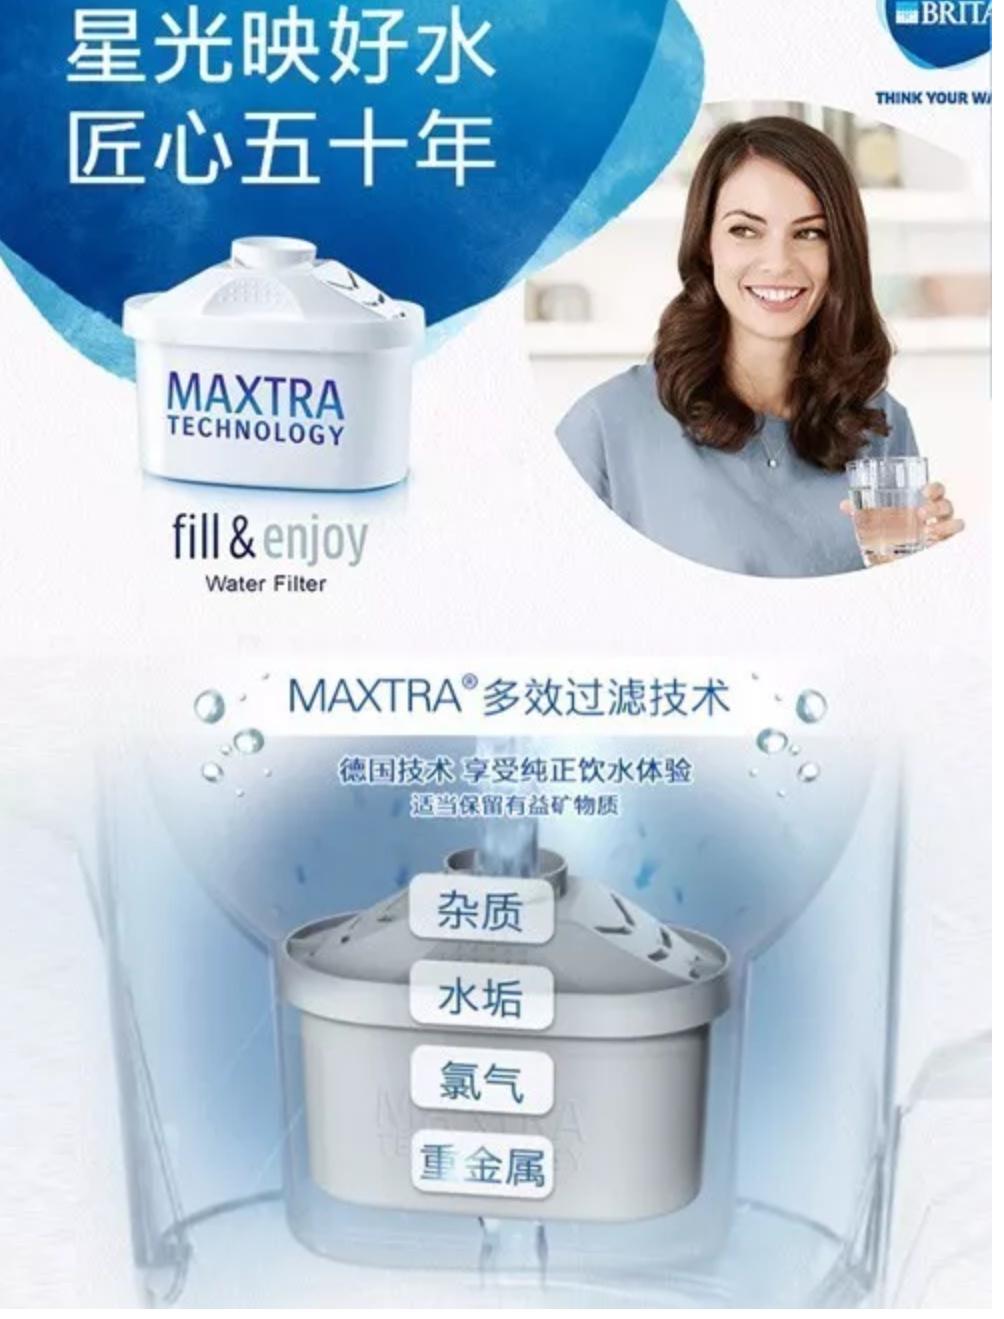 Brita过滤水壶全线Up to 40% OFF,12枚滤芯套装仅37.49磅